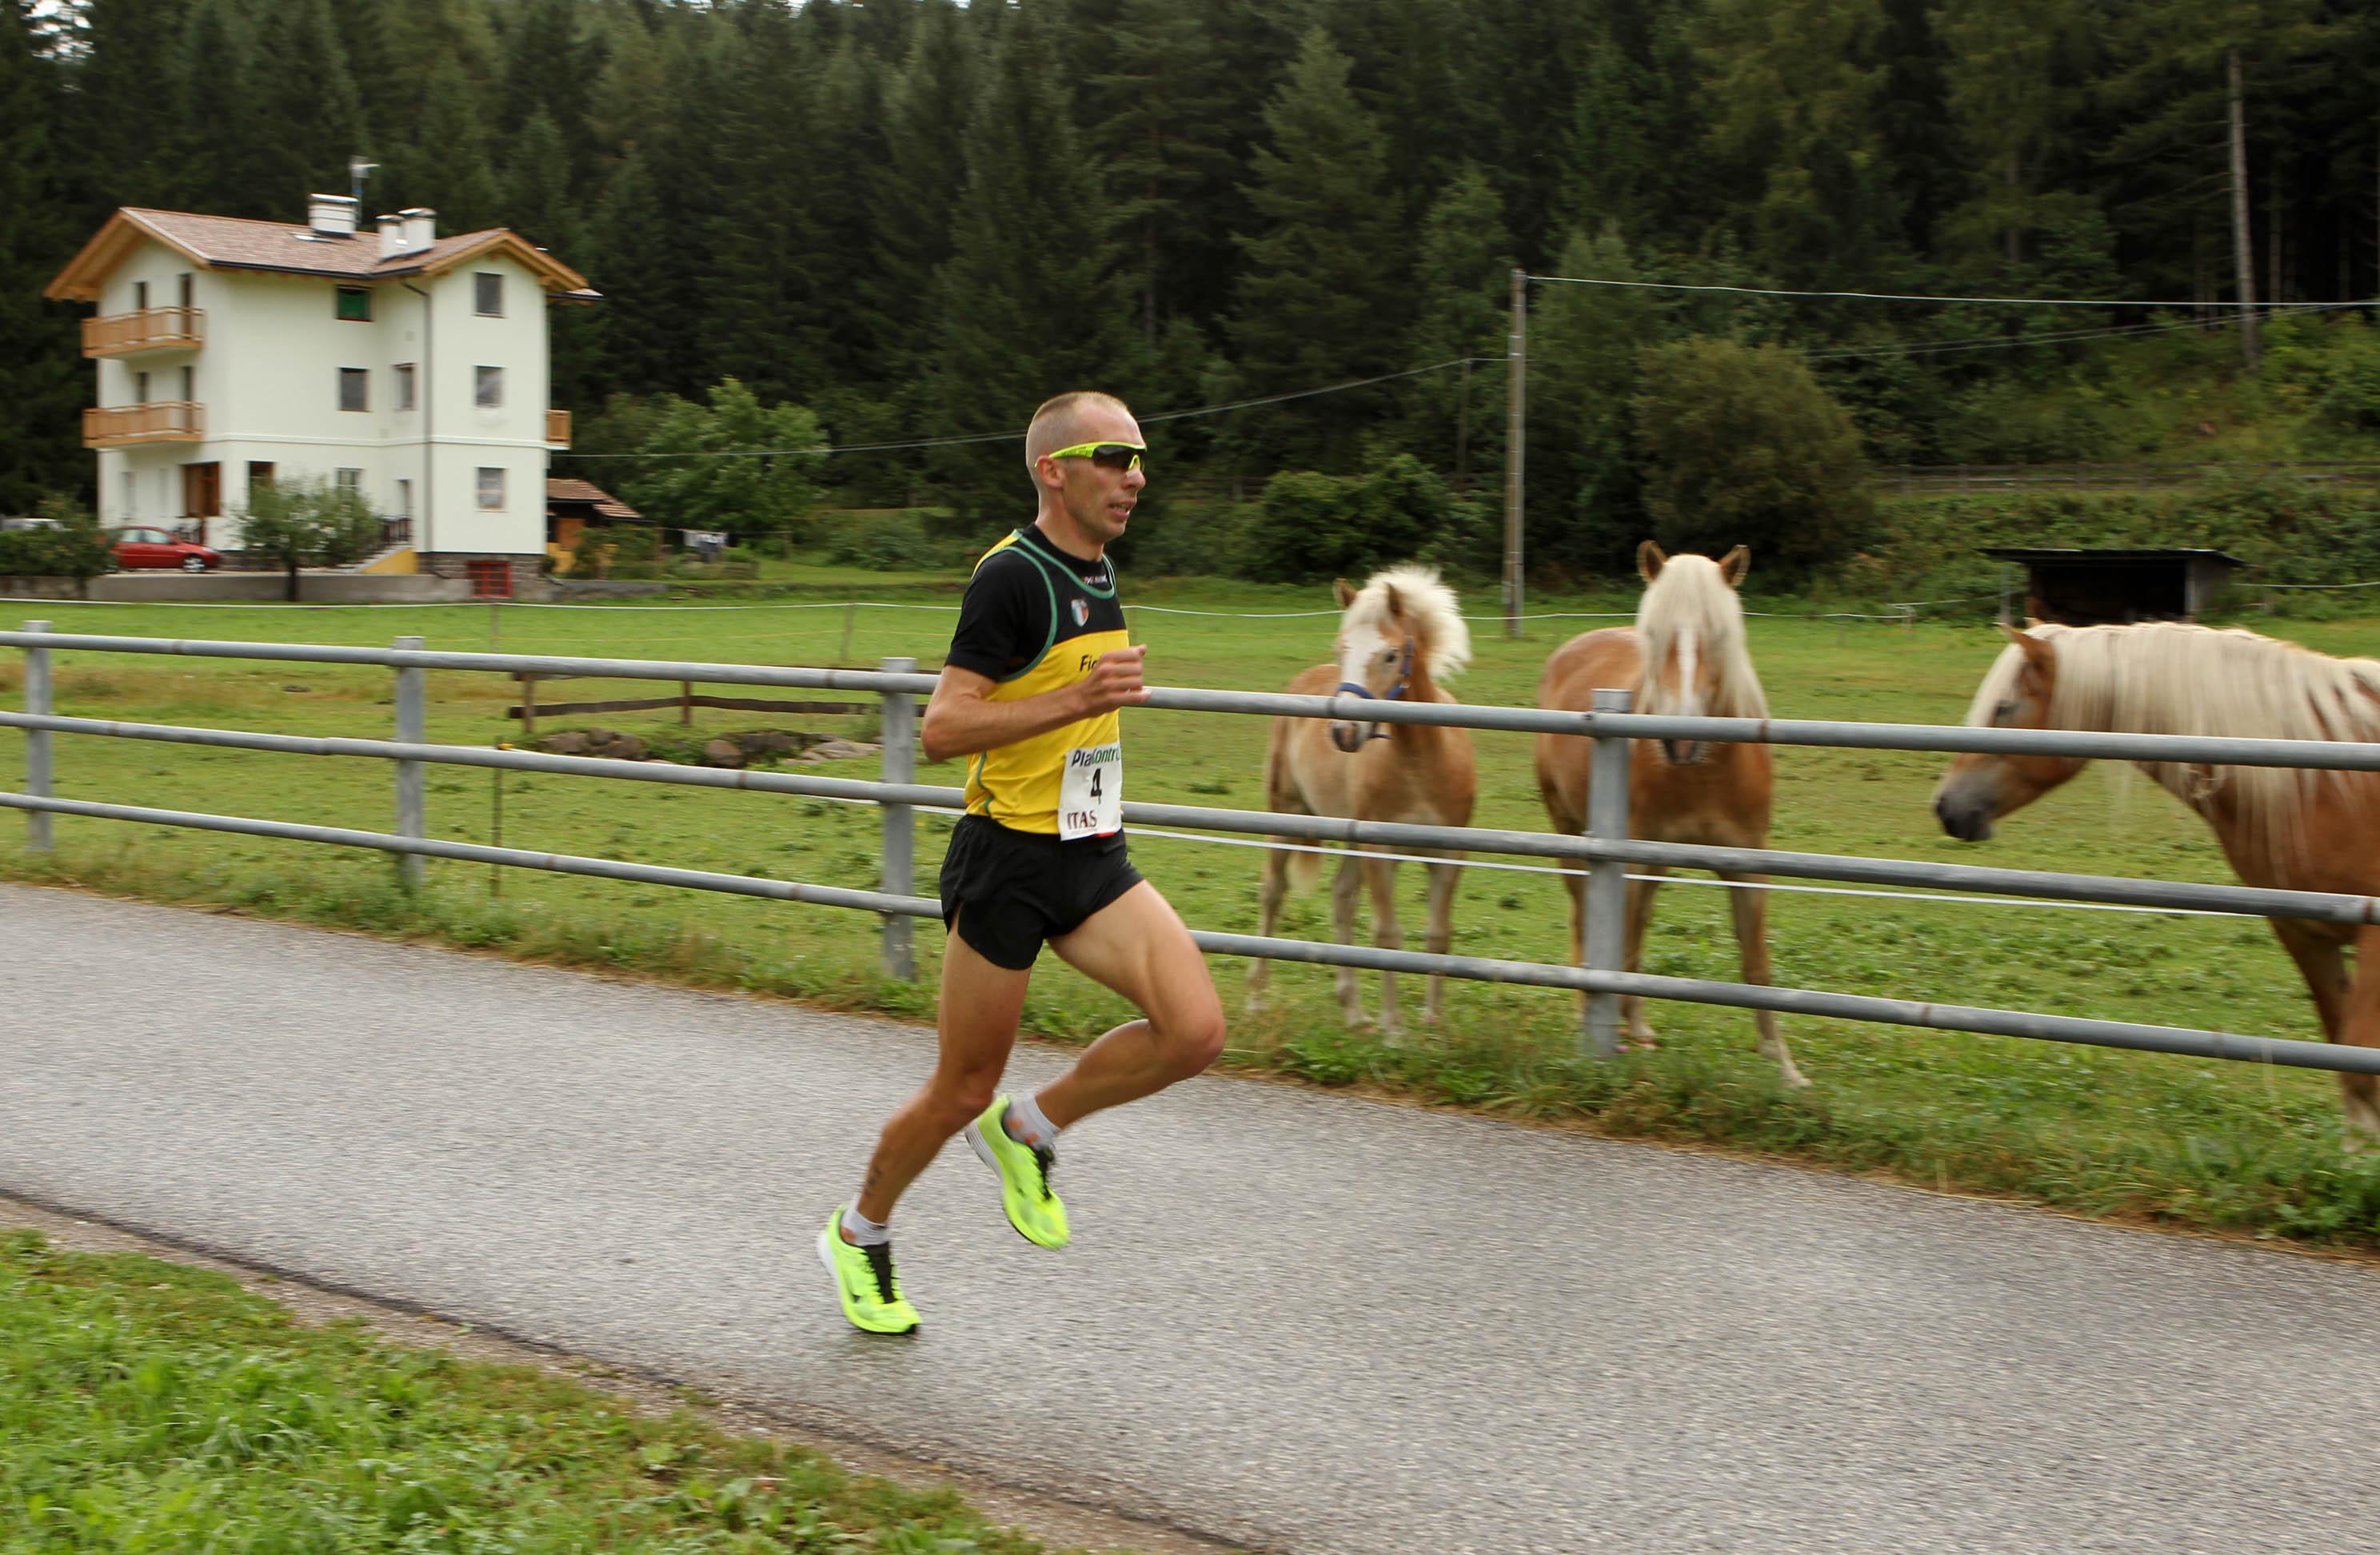 Marcialonga Running 2012, le classifiche